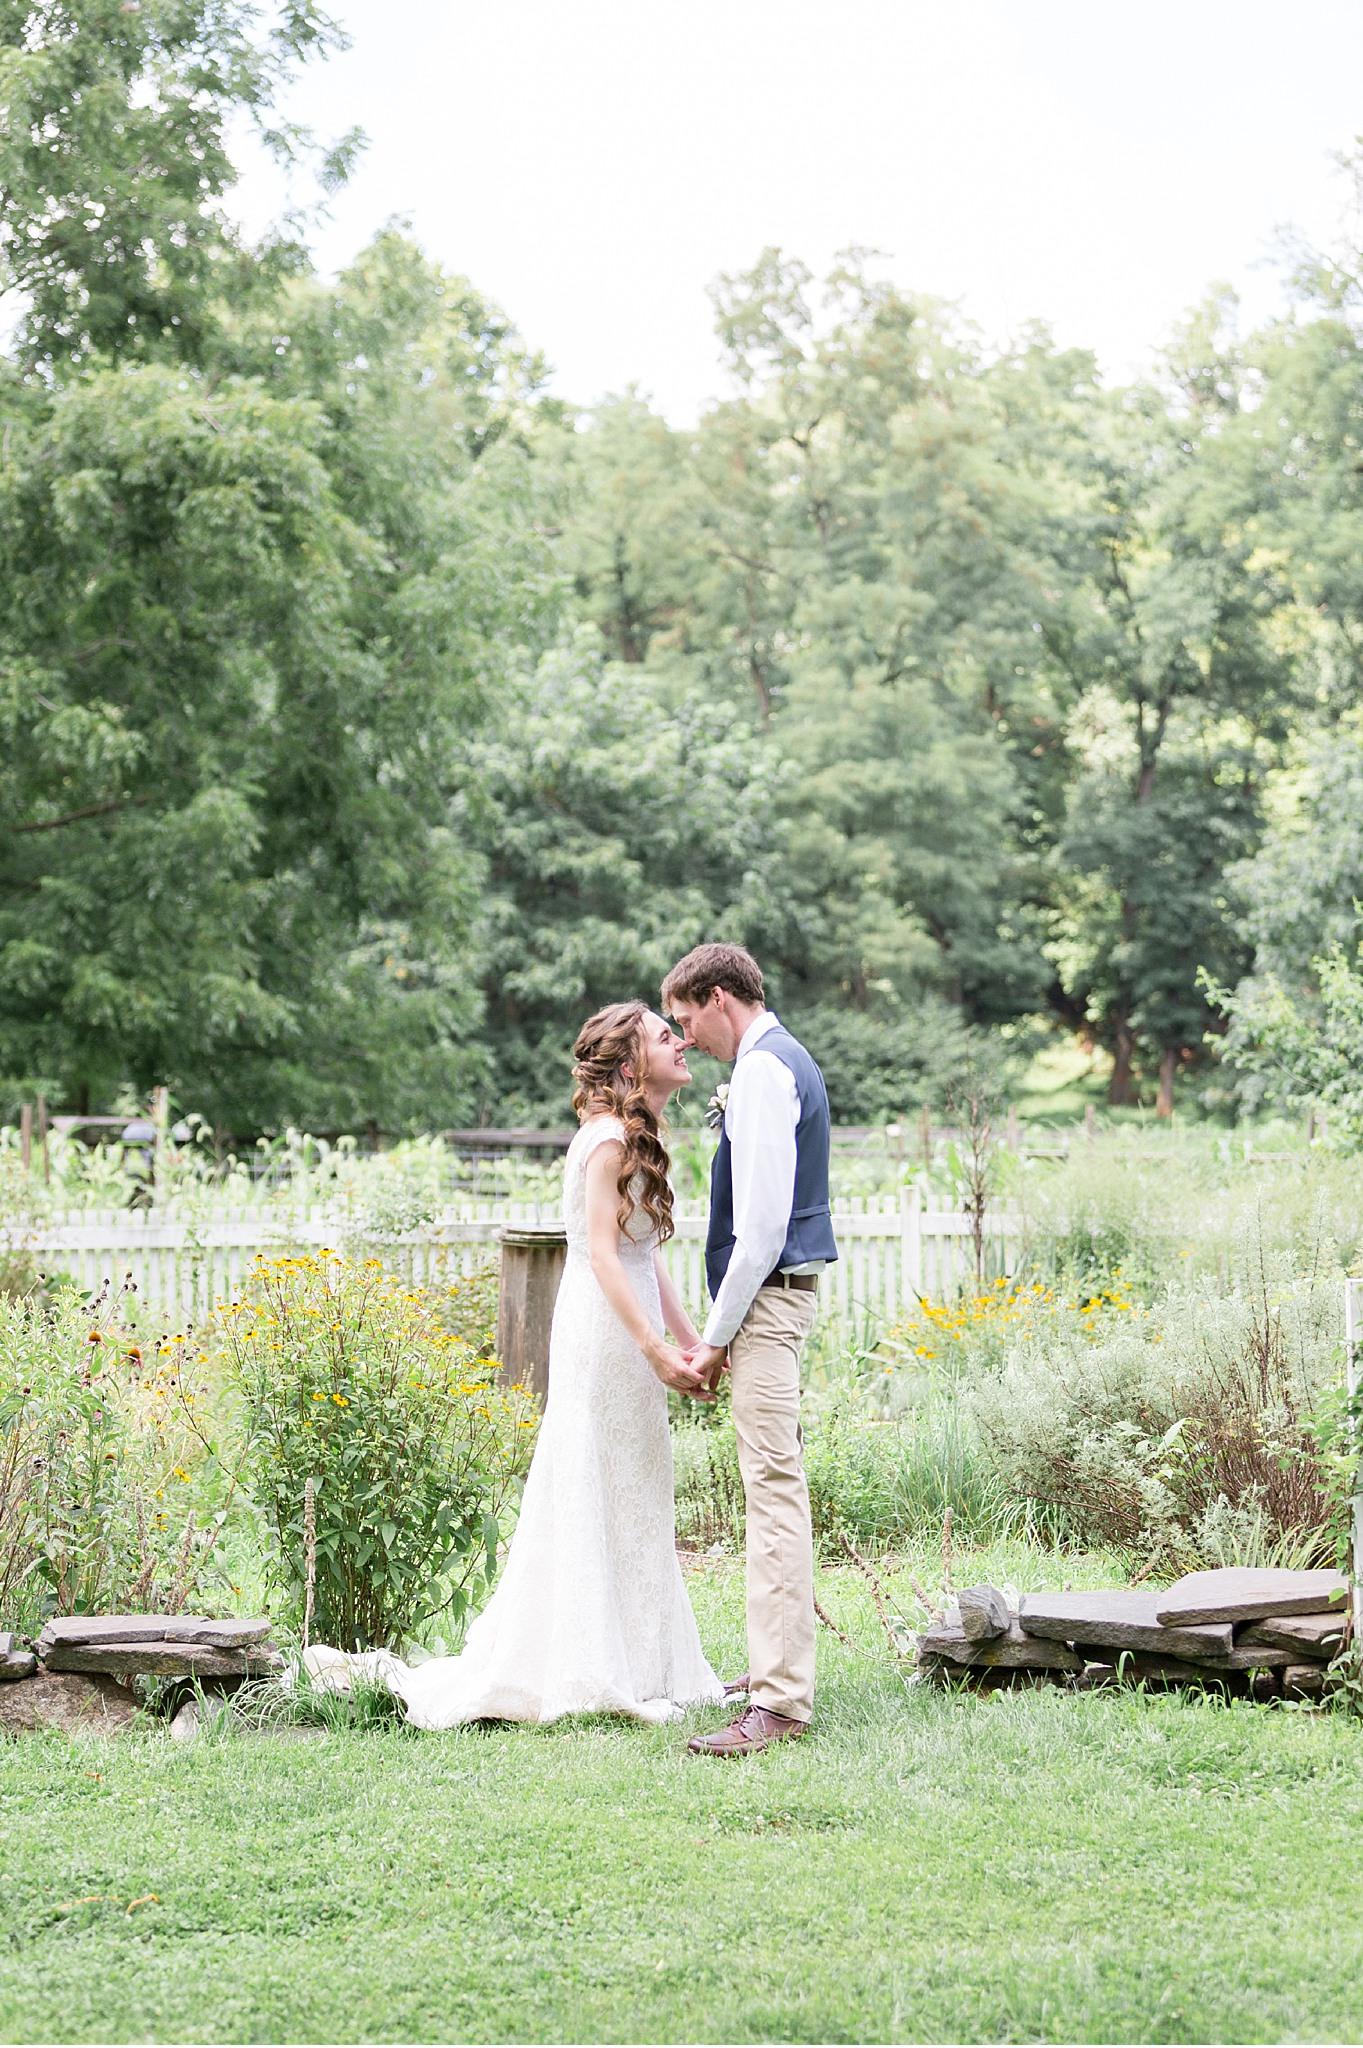 Romantic Summer wedding Landis Valley Museum Lancaster PA wedding photography John Deere Tractor_1968.jpg